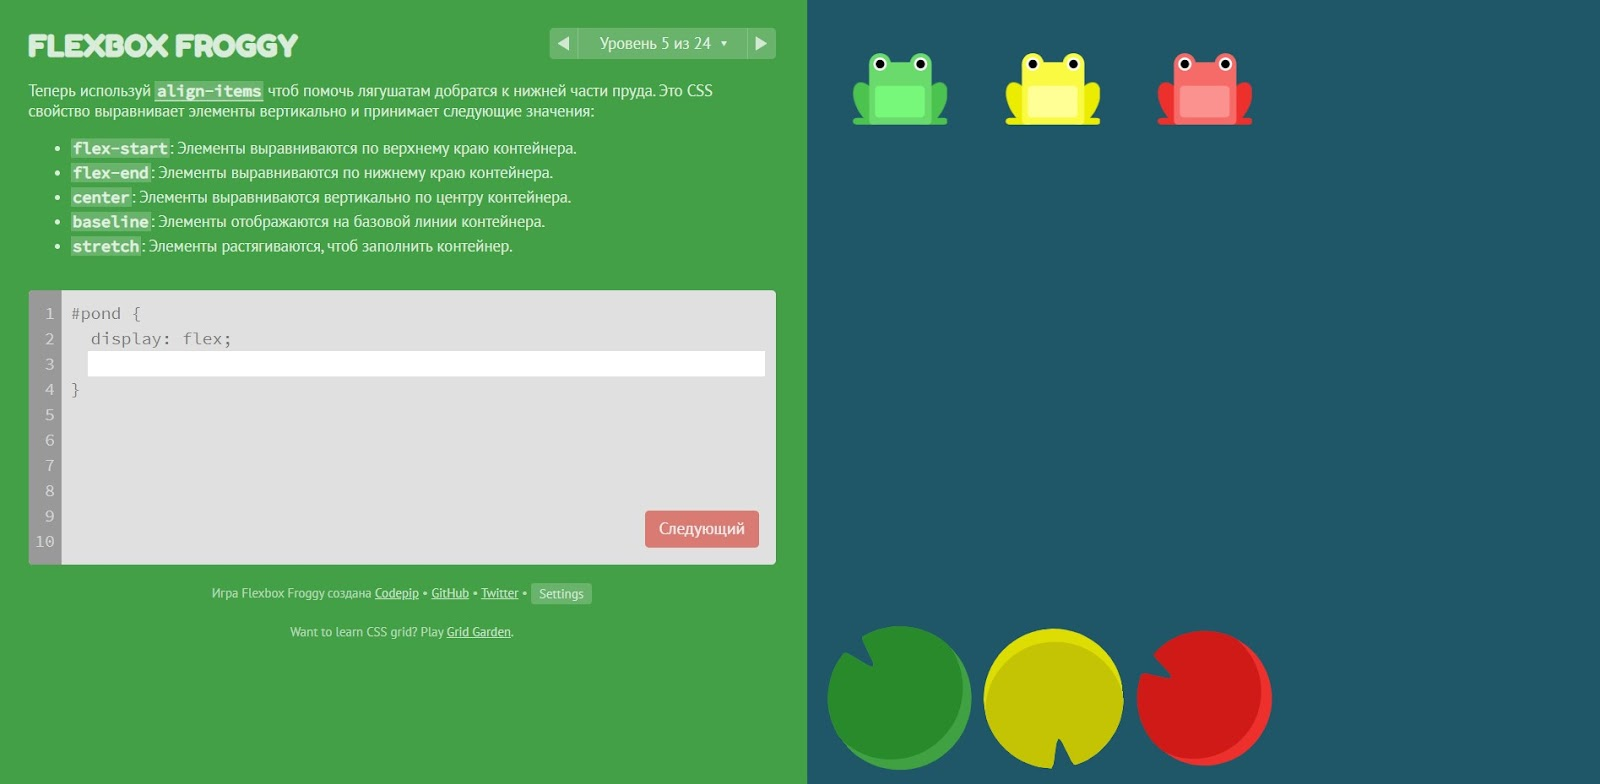 Скриншот игры Flexbox Froggy